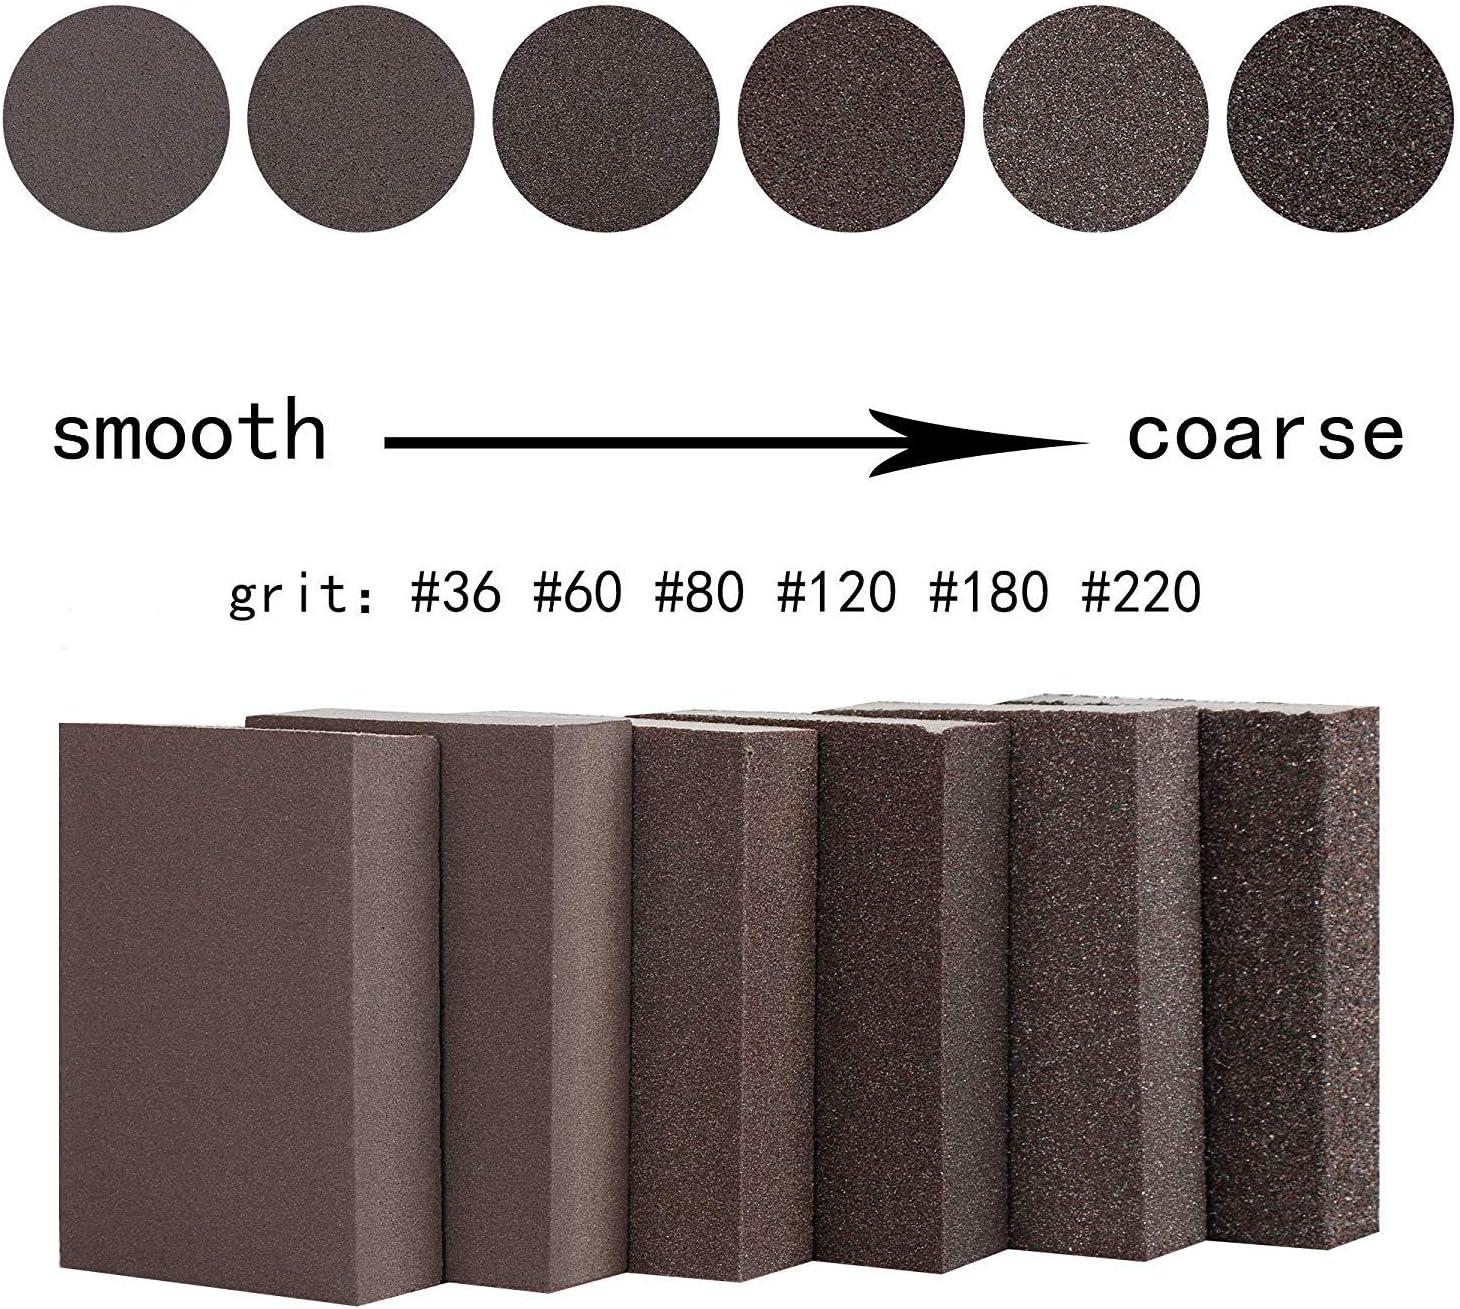 Liyafy 6pcs 80# Grit Sponge Emery Cloth Sandpaper Blocks Buffing Diamond Polishing Pads Hand Sanding Tool